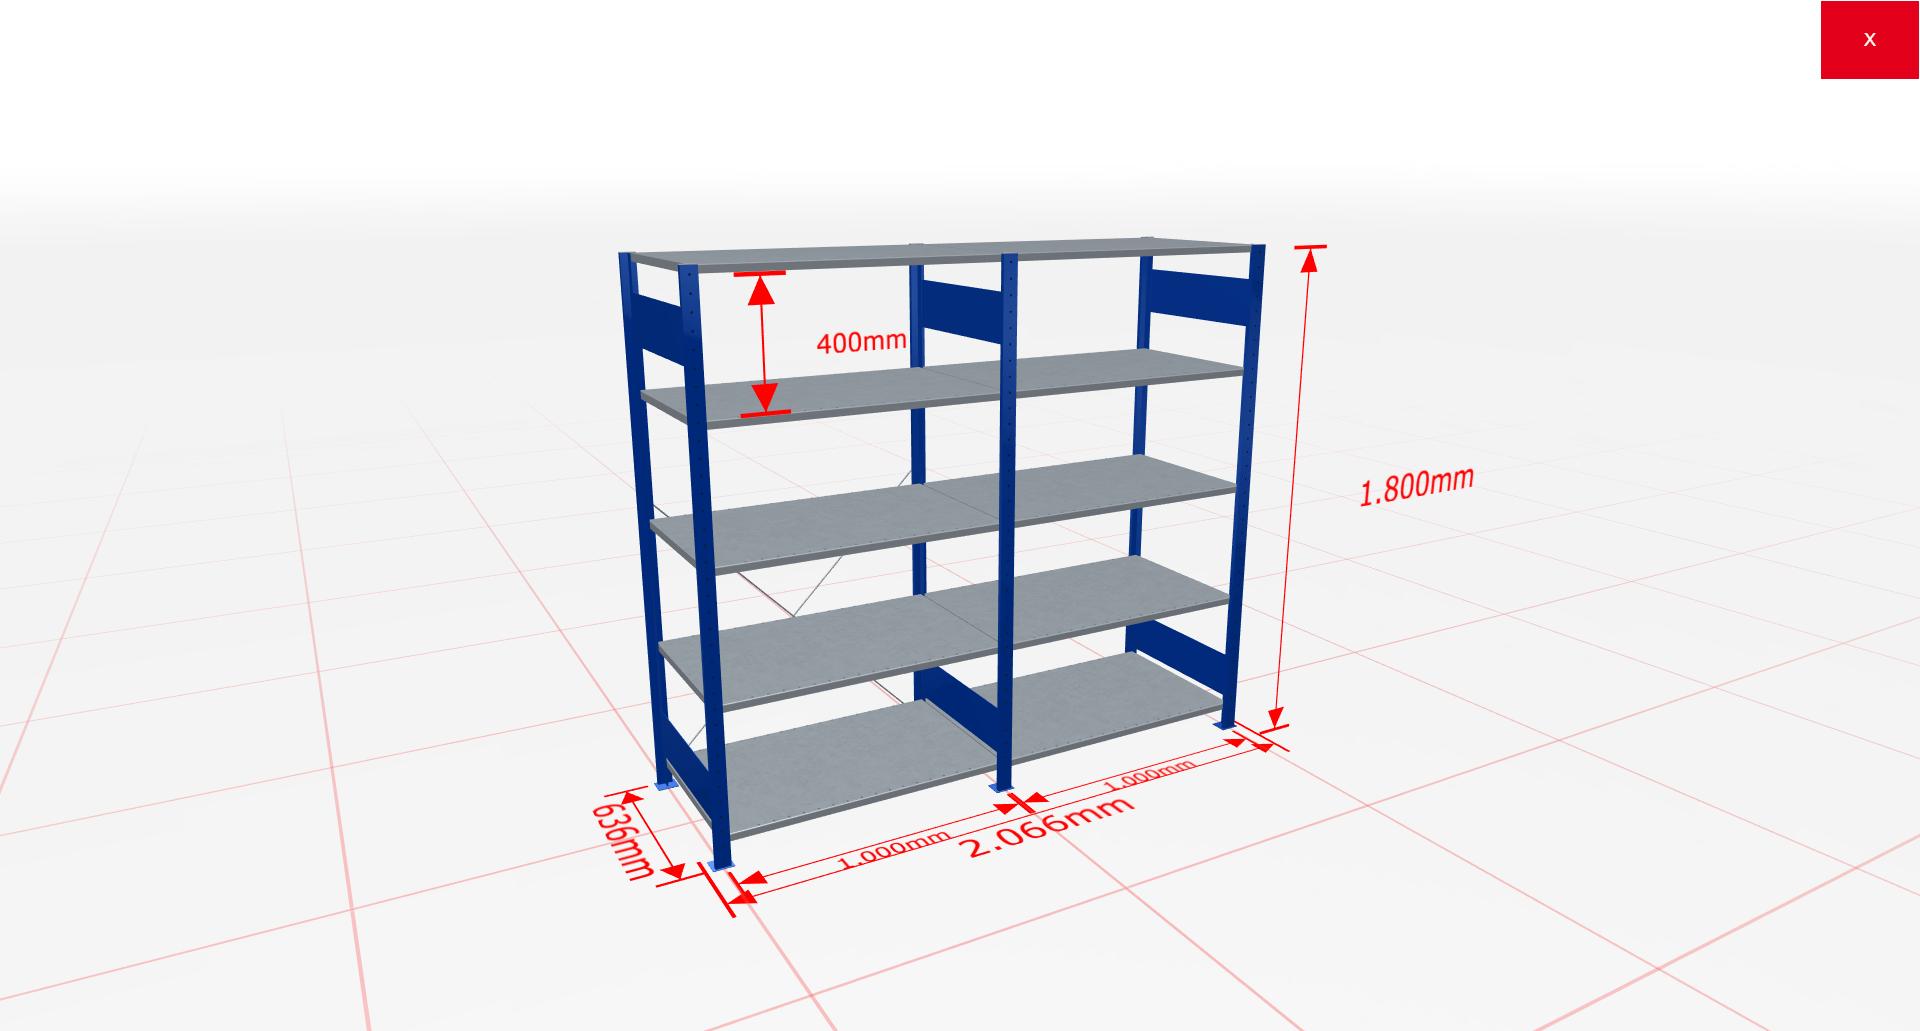 Fachbodenregal Komplettregal 1800x2066x600 mm (HxBxT) SCHULTE Lagertechnik blau 5 Ebenen  150 kg je Boden